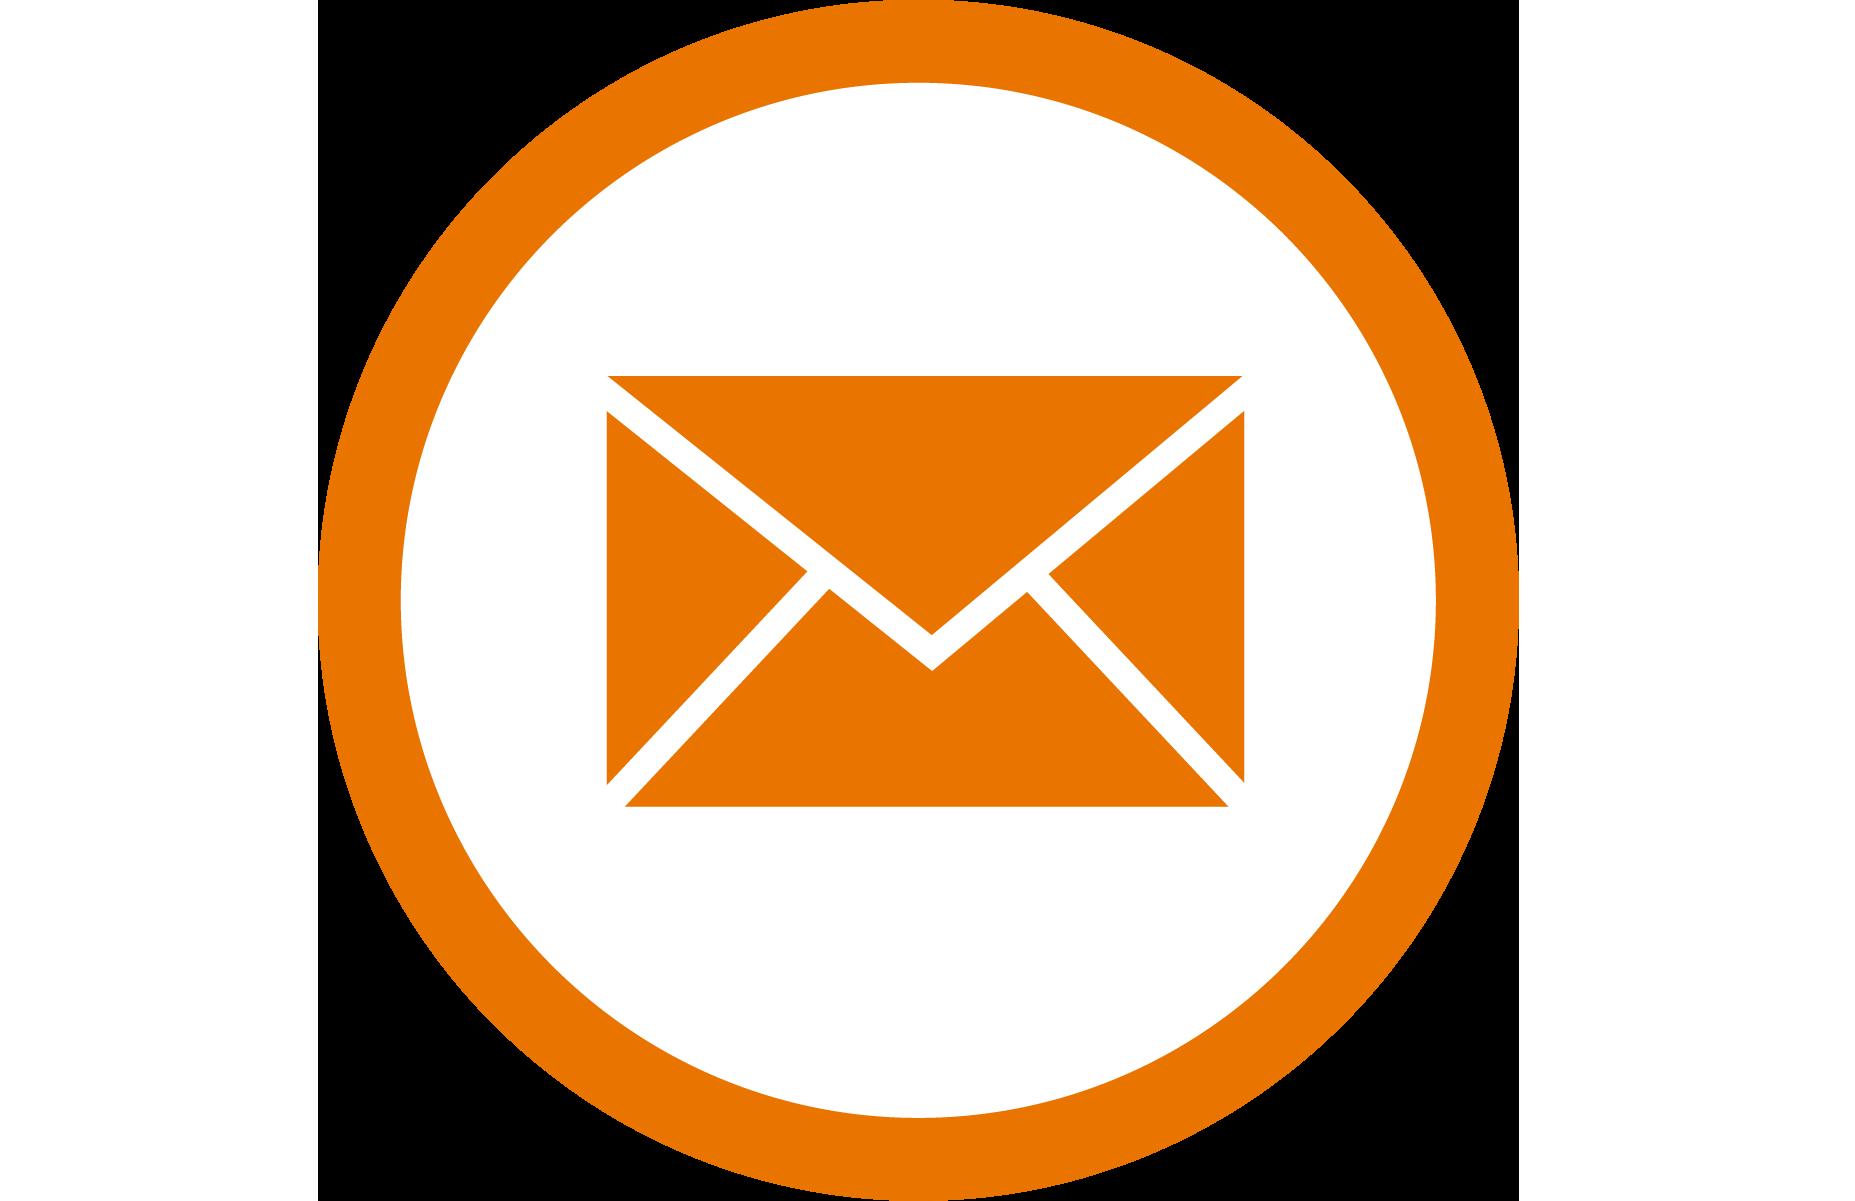 КСЭ электронная почта